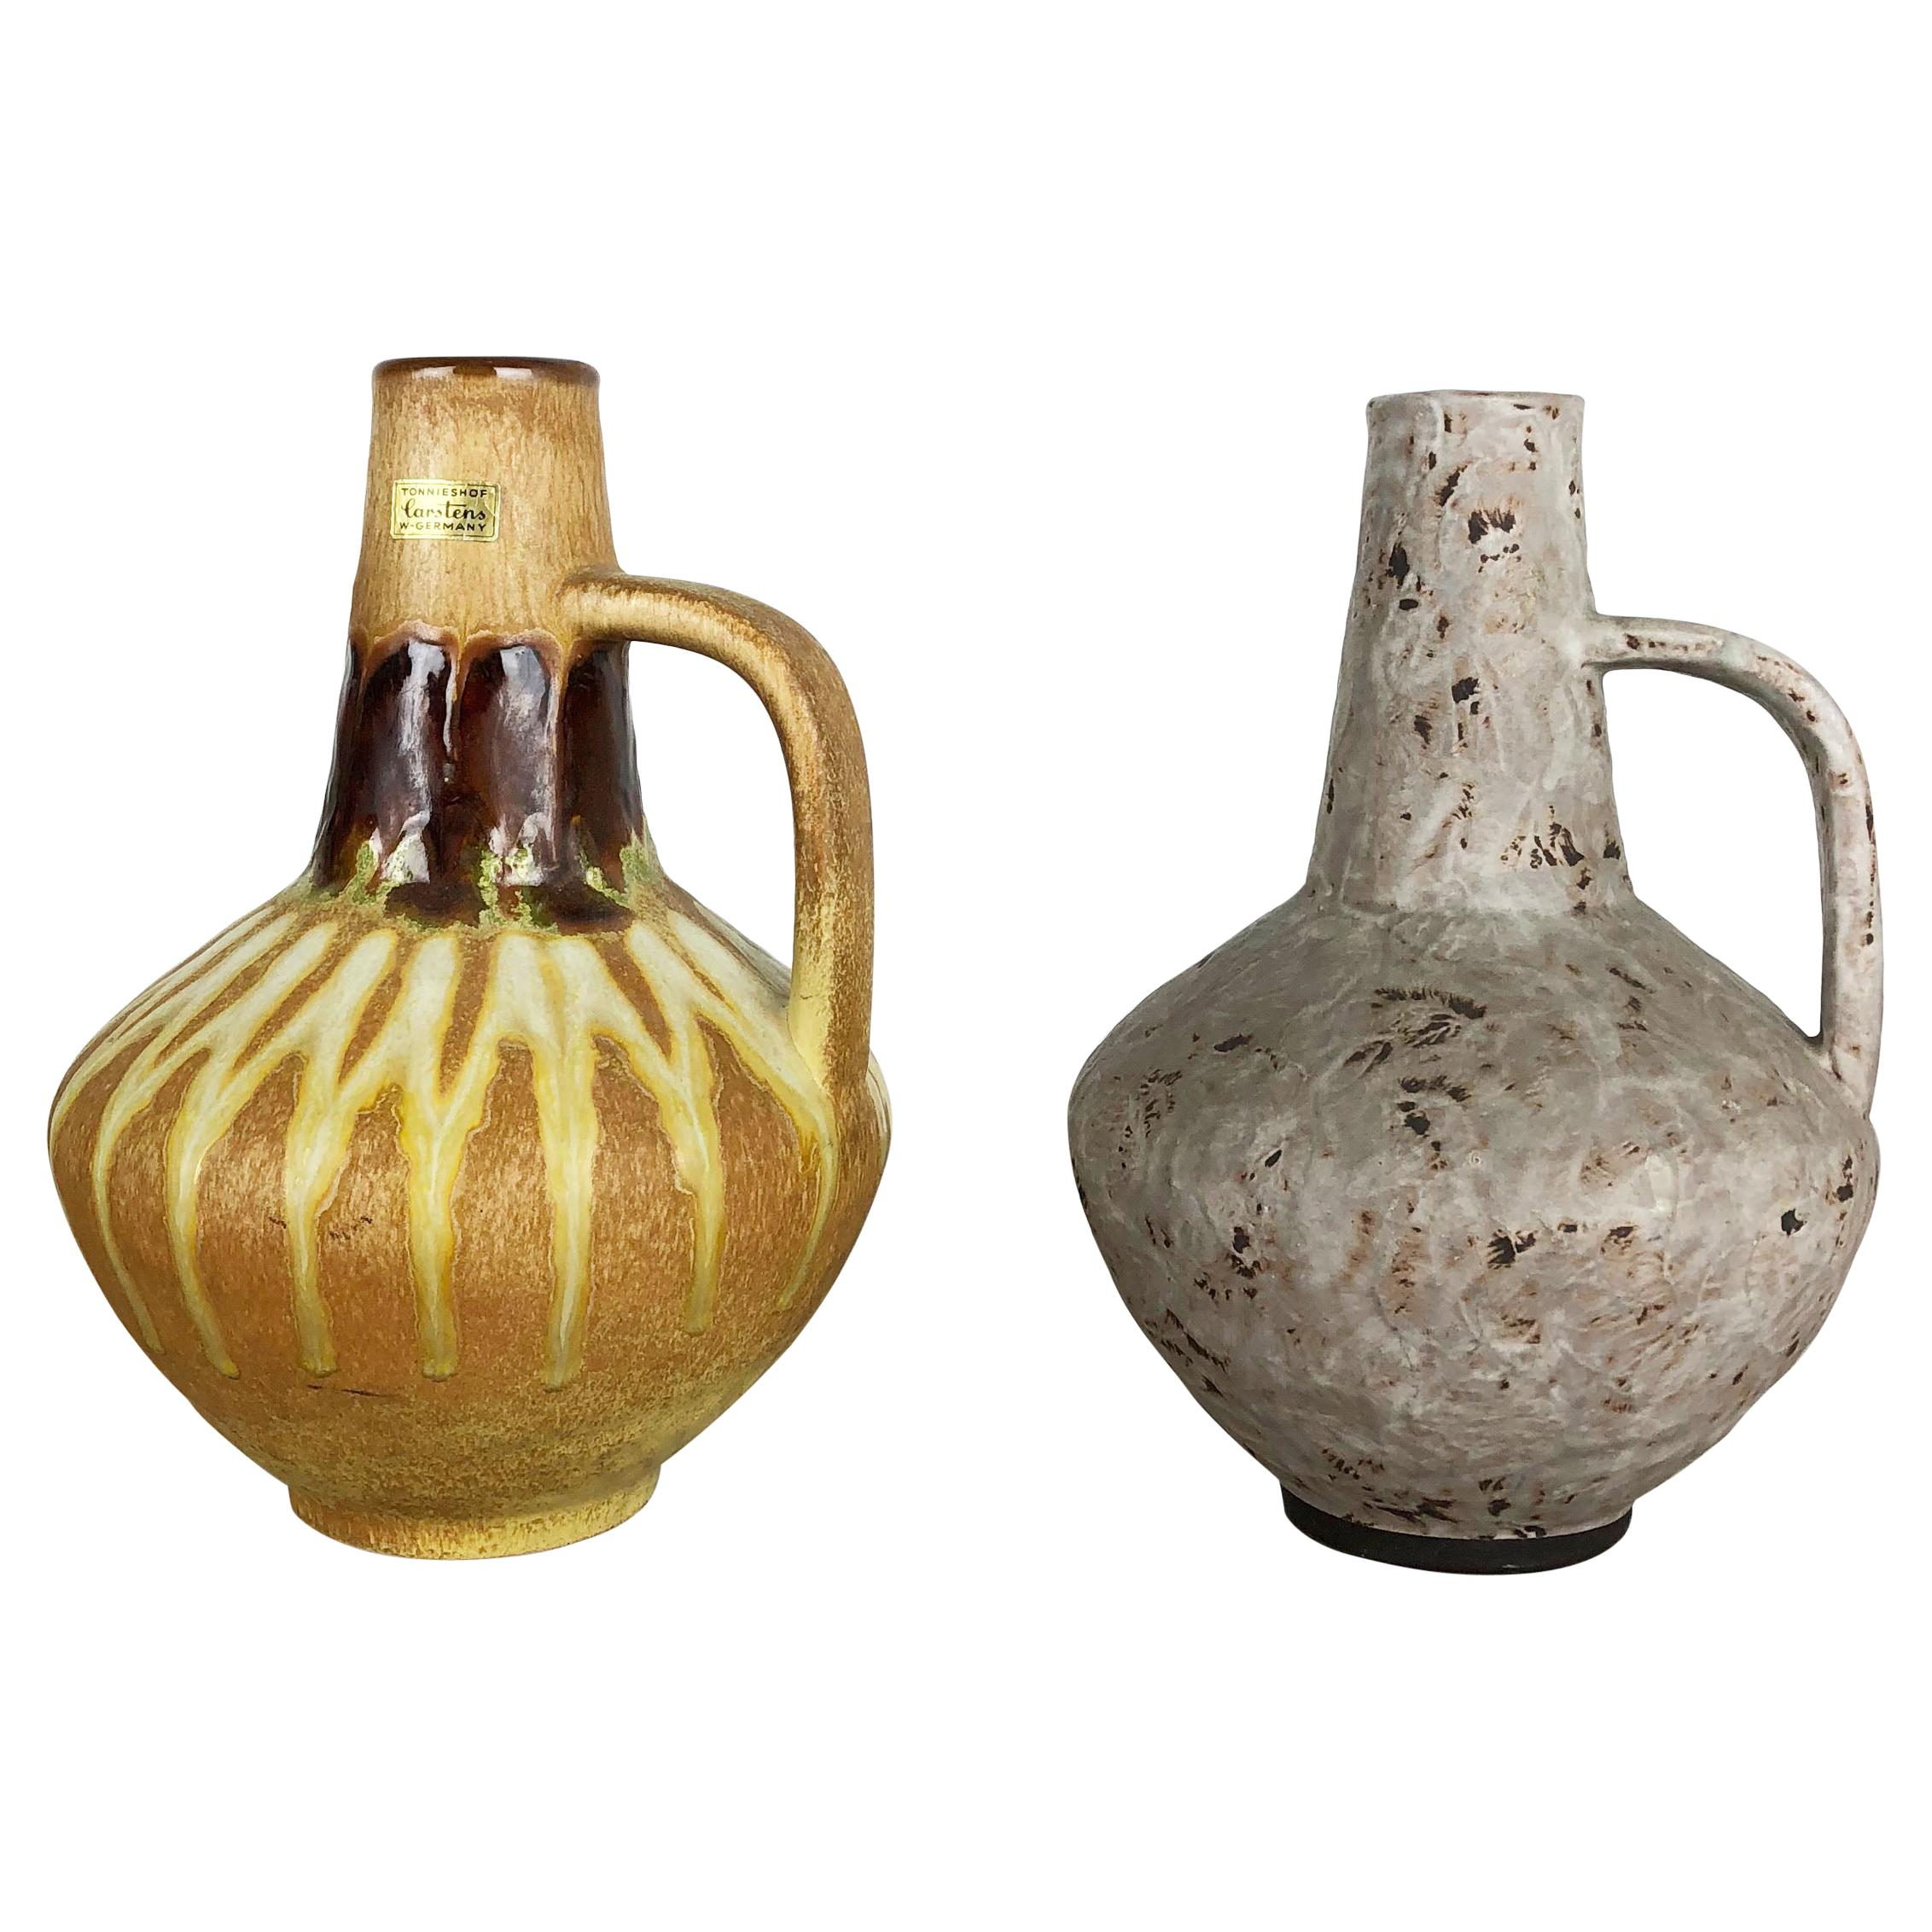 Set of 2 Ceramic Pottery Vase Heinz Siery Carstens Tönnieshof, Germany, 1970s